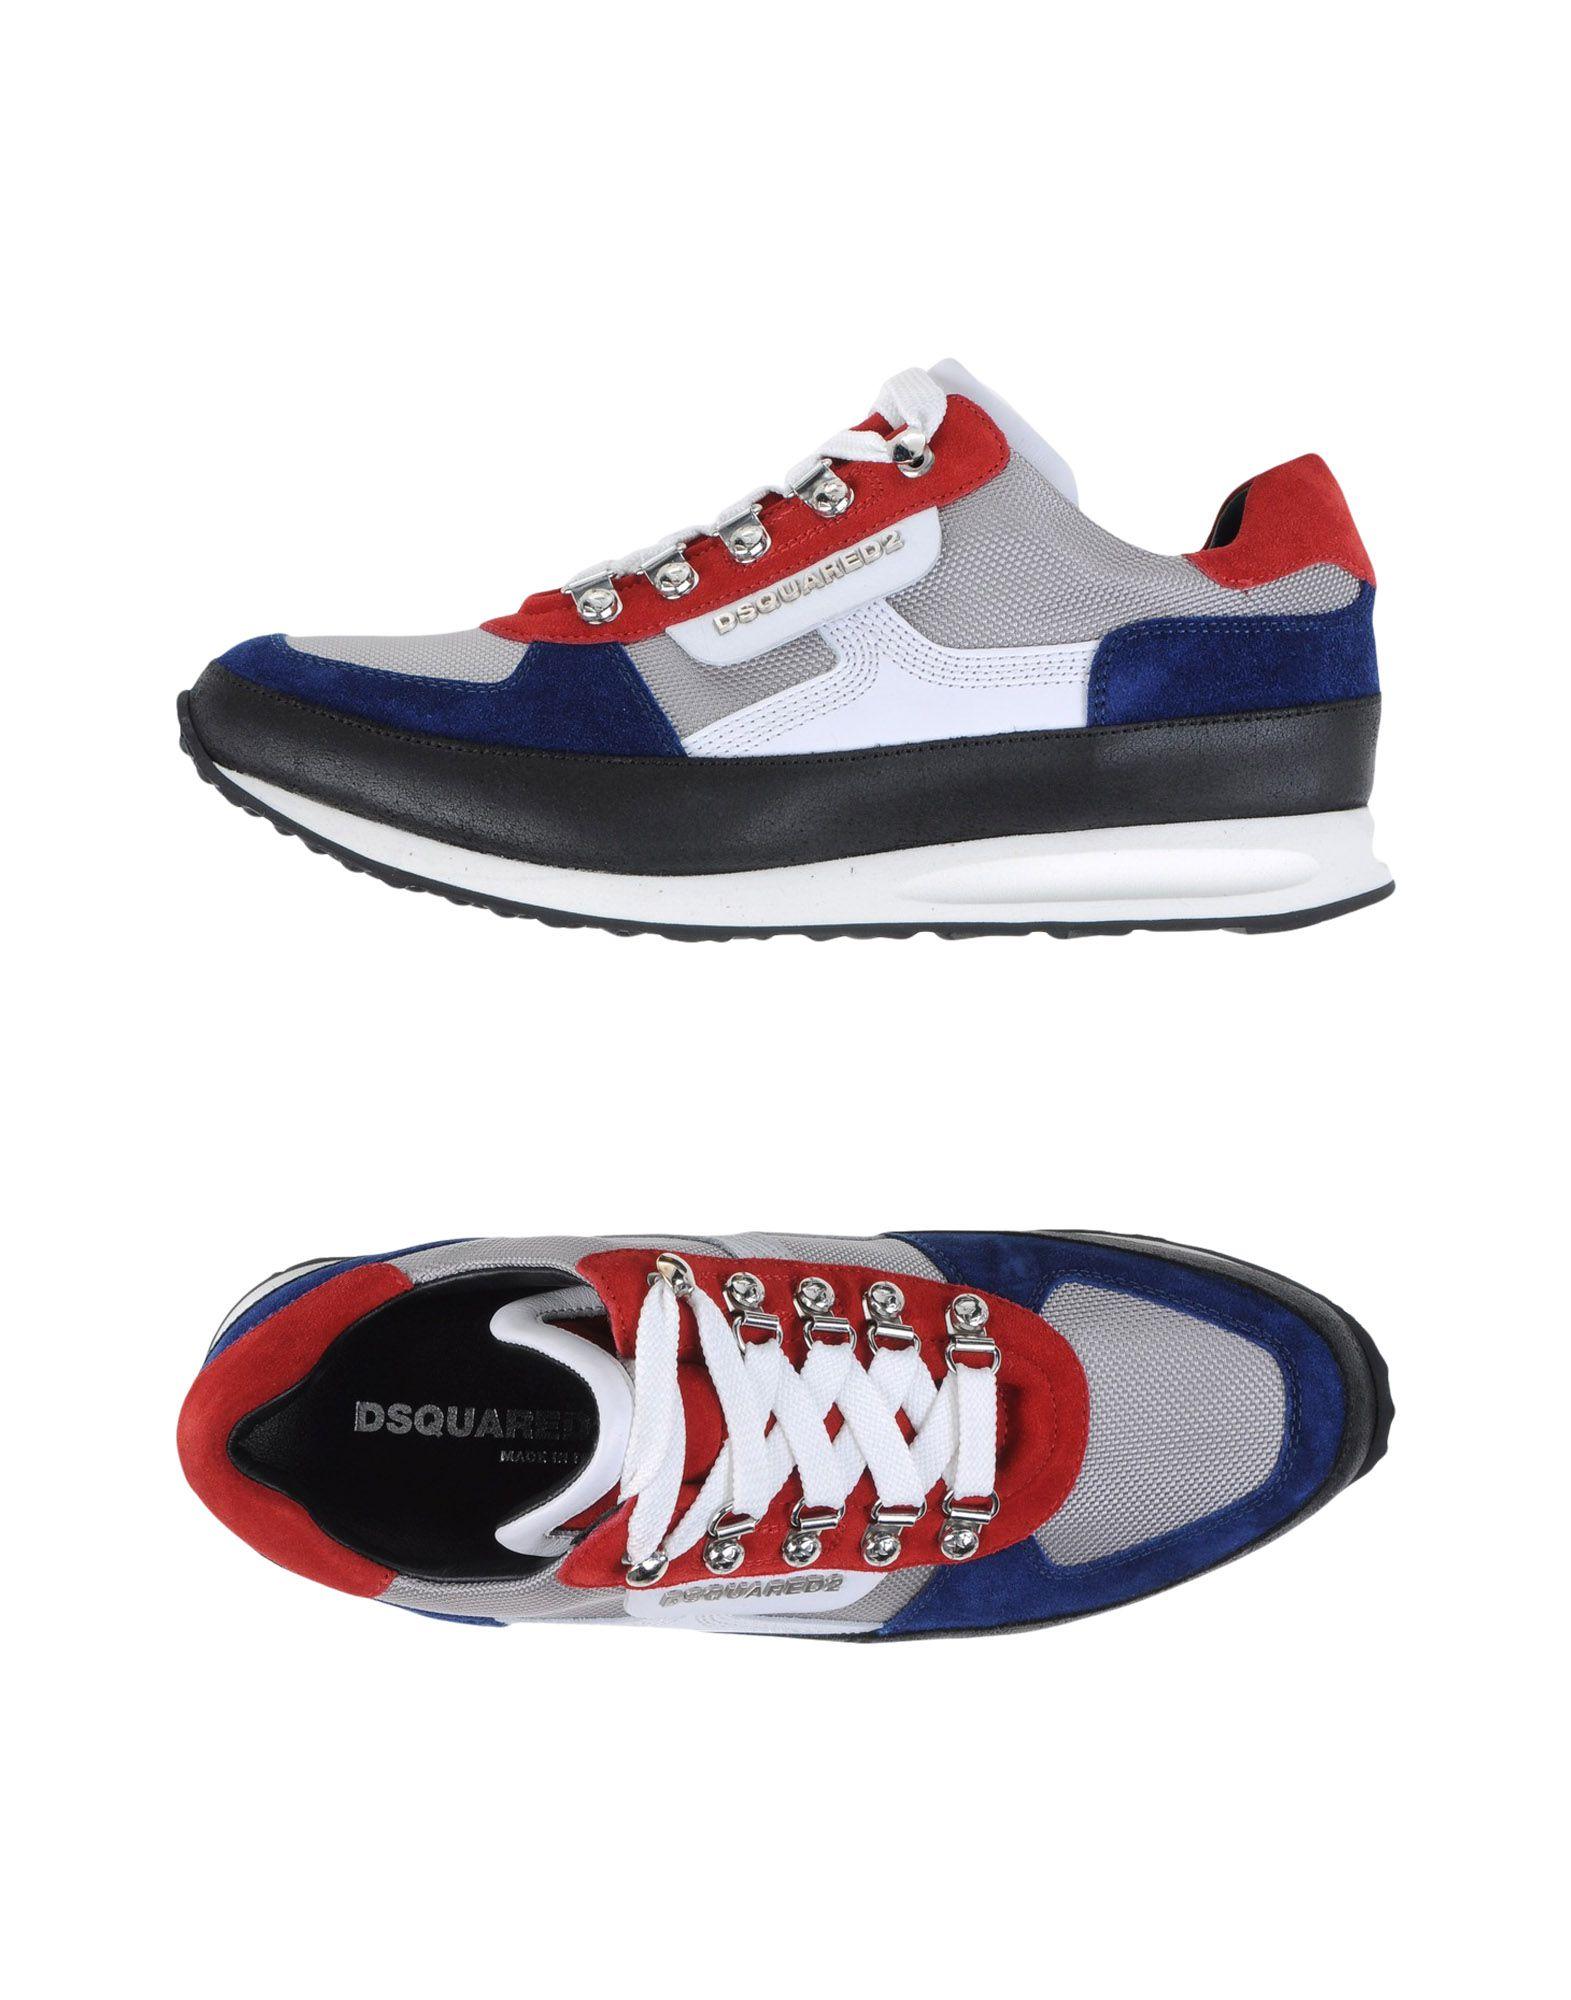 Rabatt Schuhe Dsquared2 Sneakers  Damen  Sneakers 11082273EX 16ab49